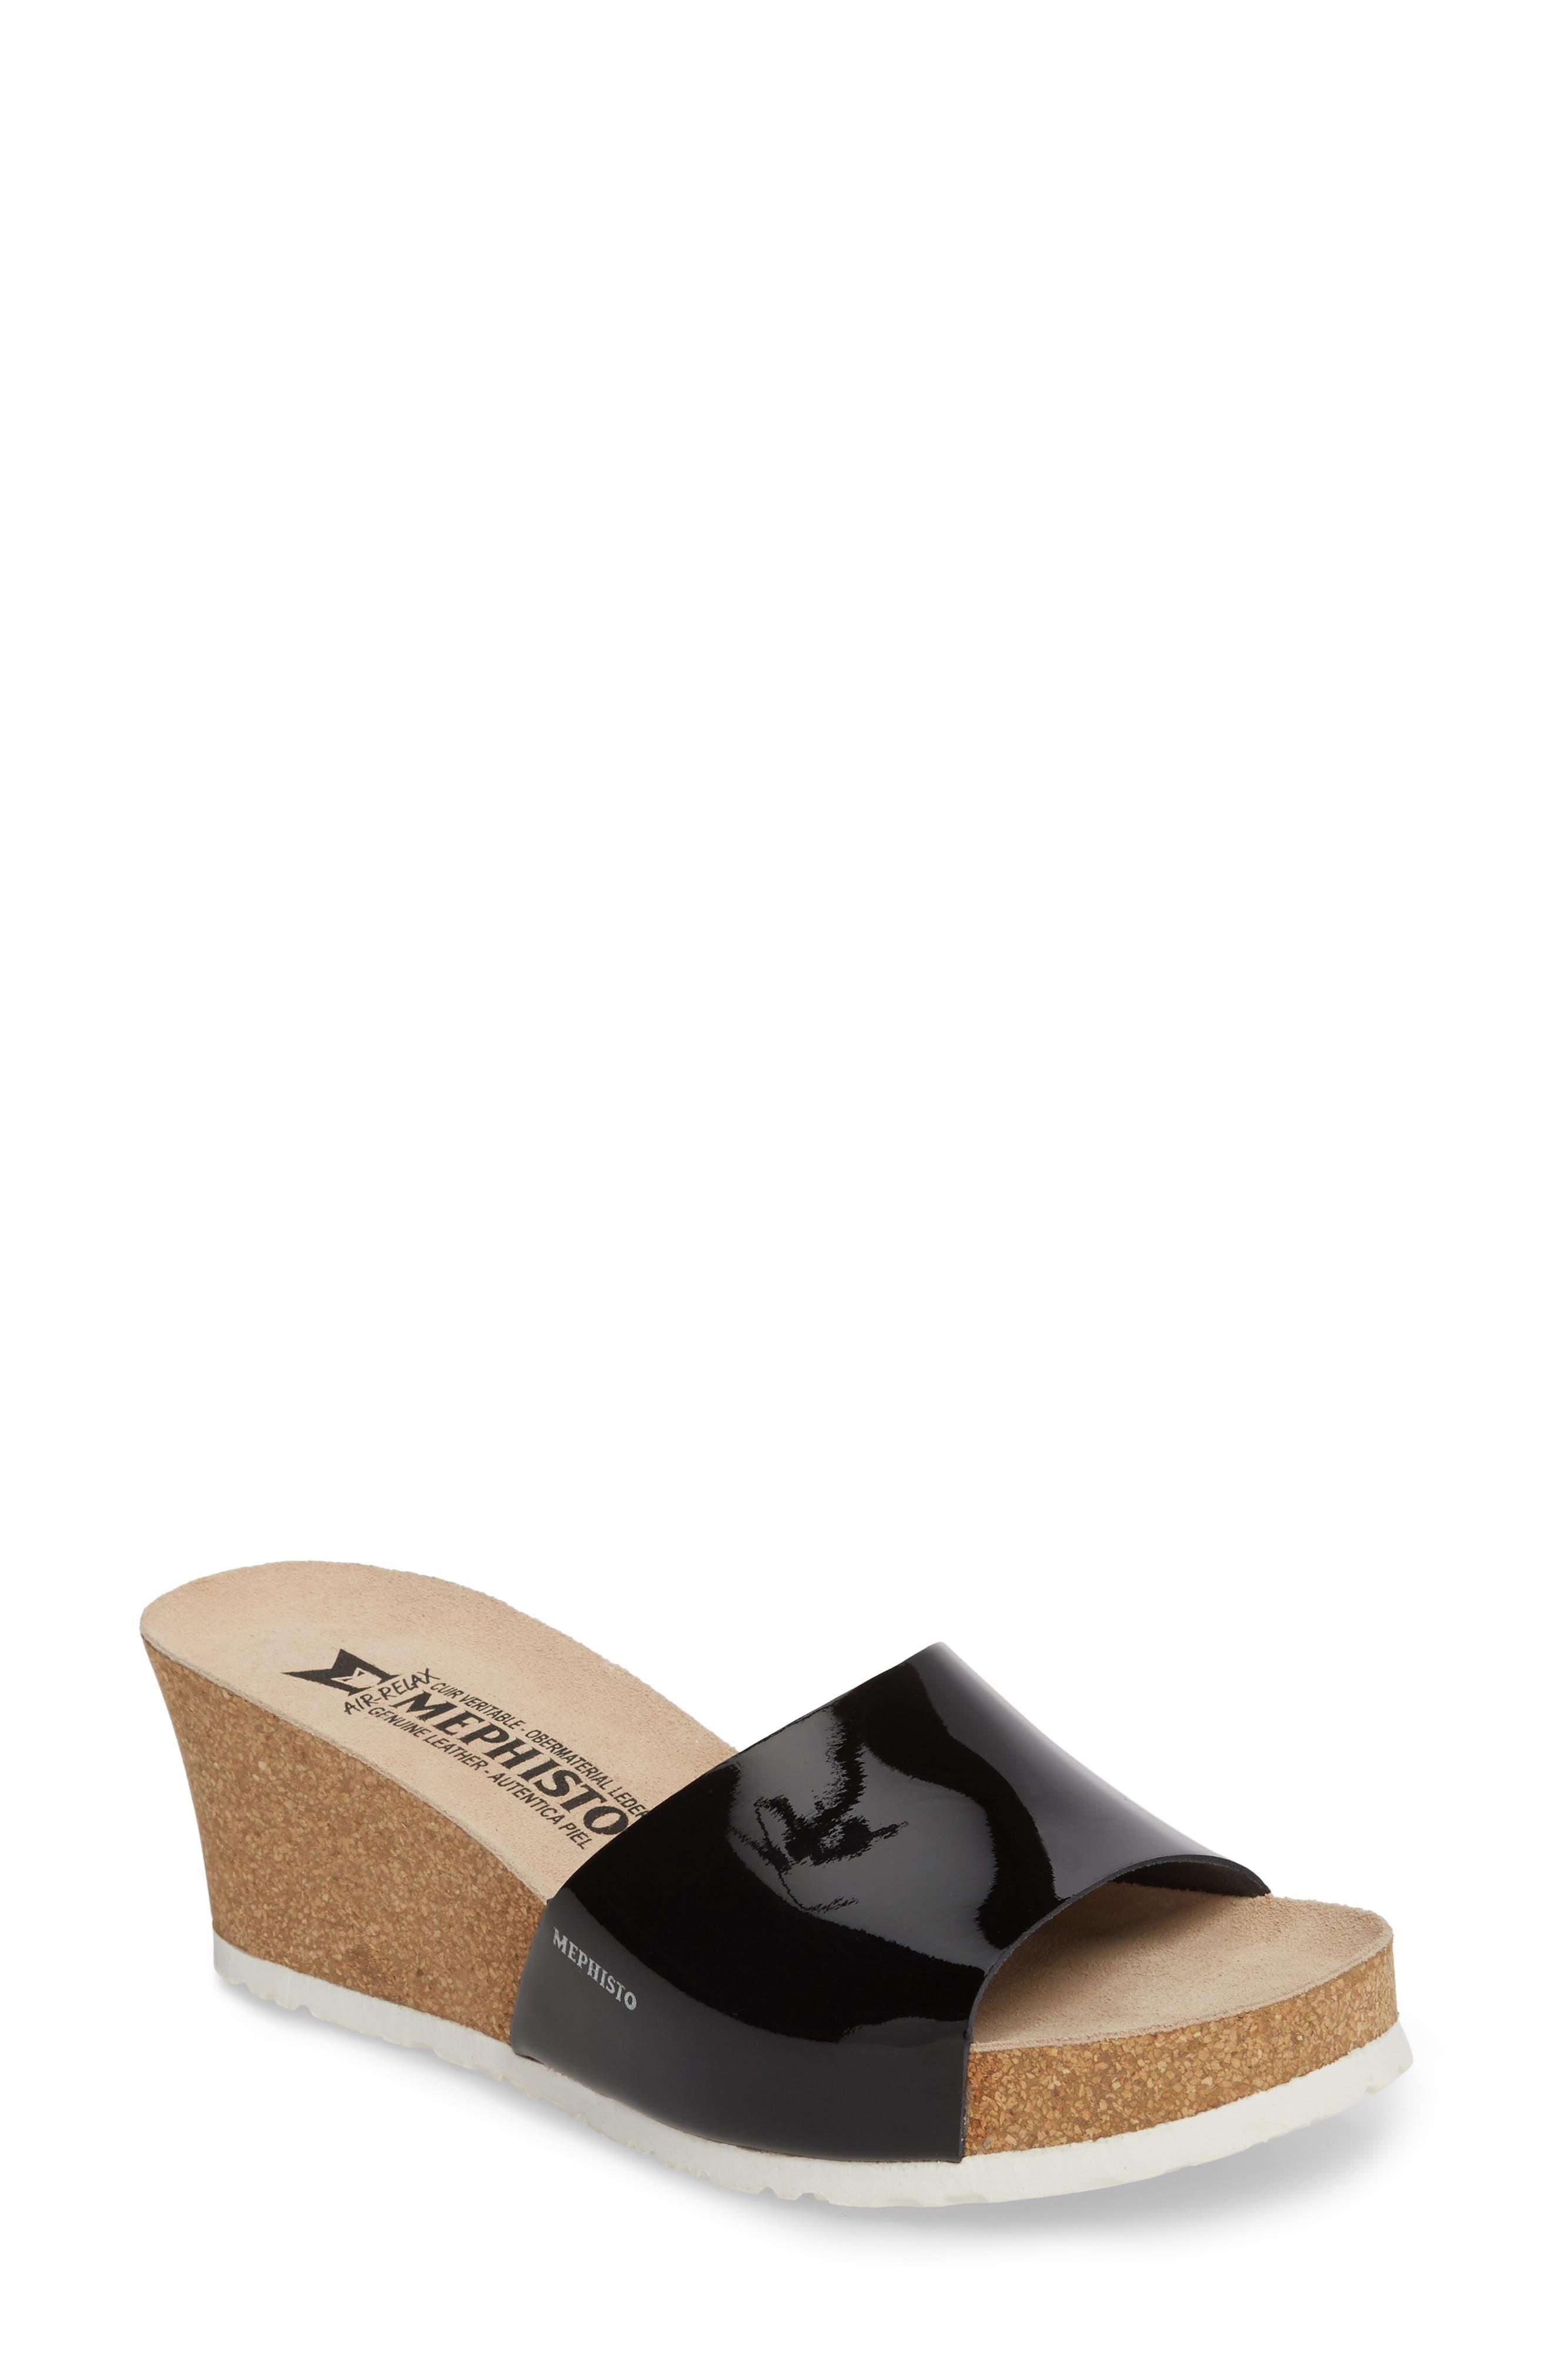 Lise Platform Wedge Sandal,                             Main thumbnail 1, color,                             Black